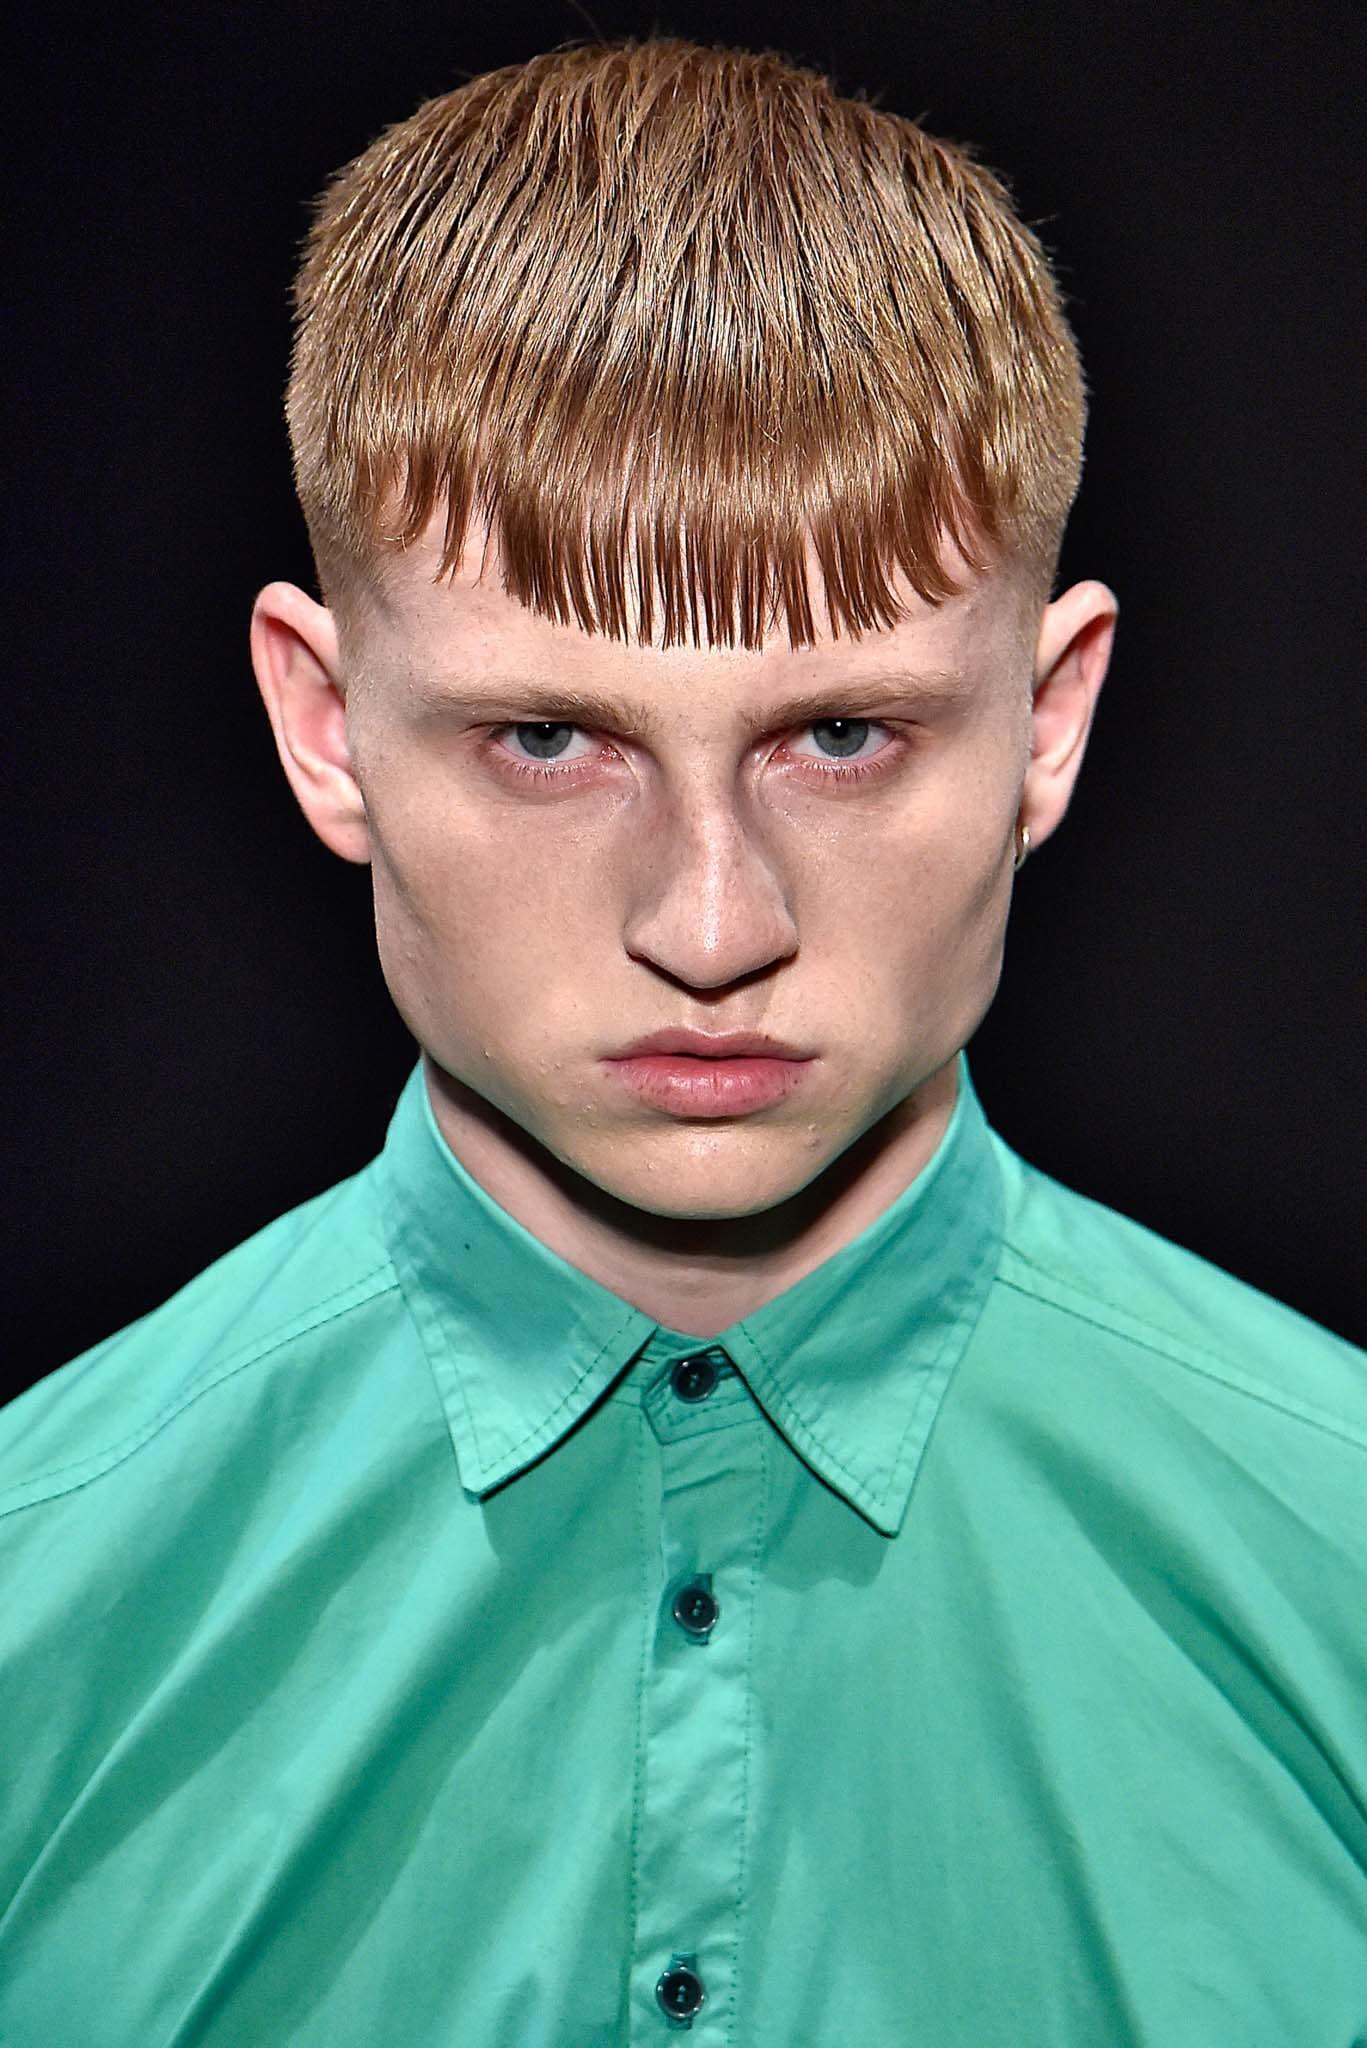 Hombre pelirrojo, cabello corto peinado hacia adelante